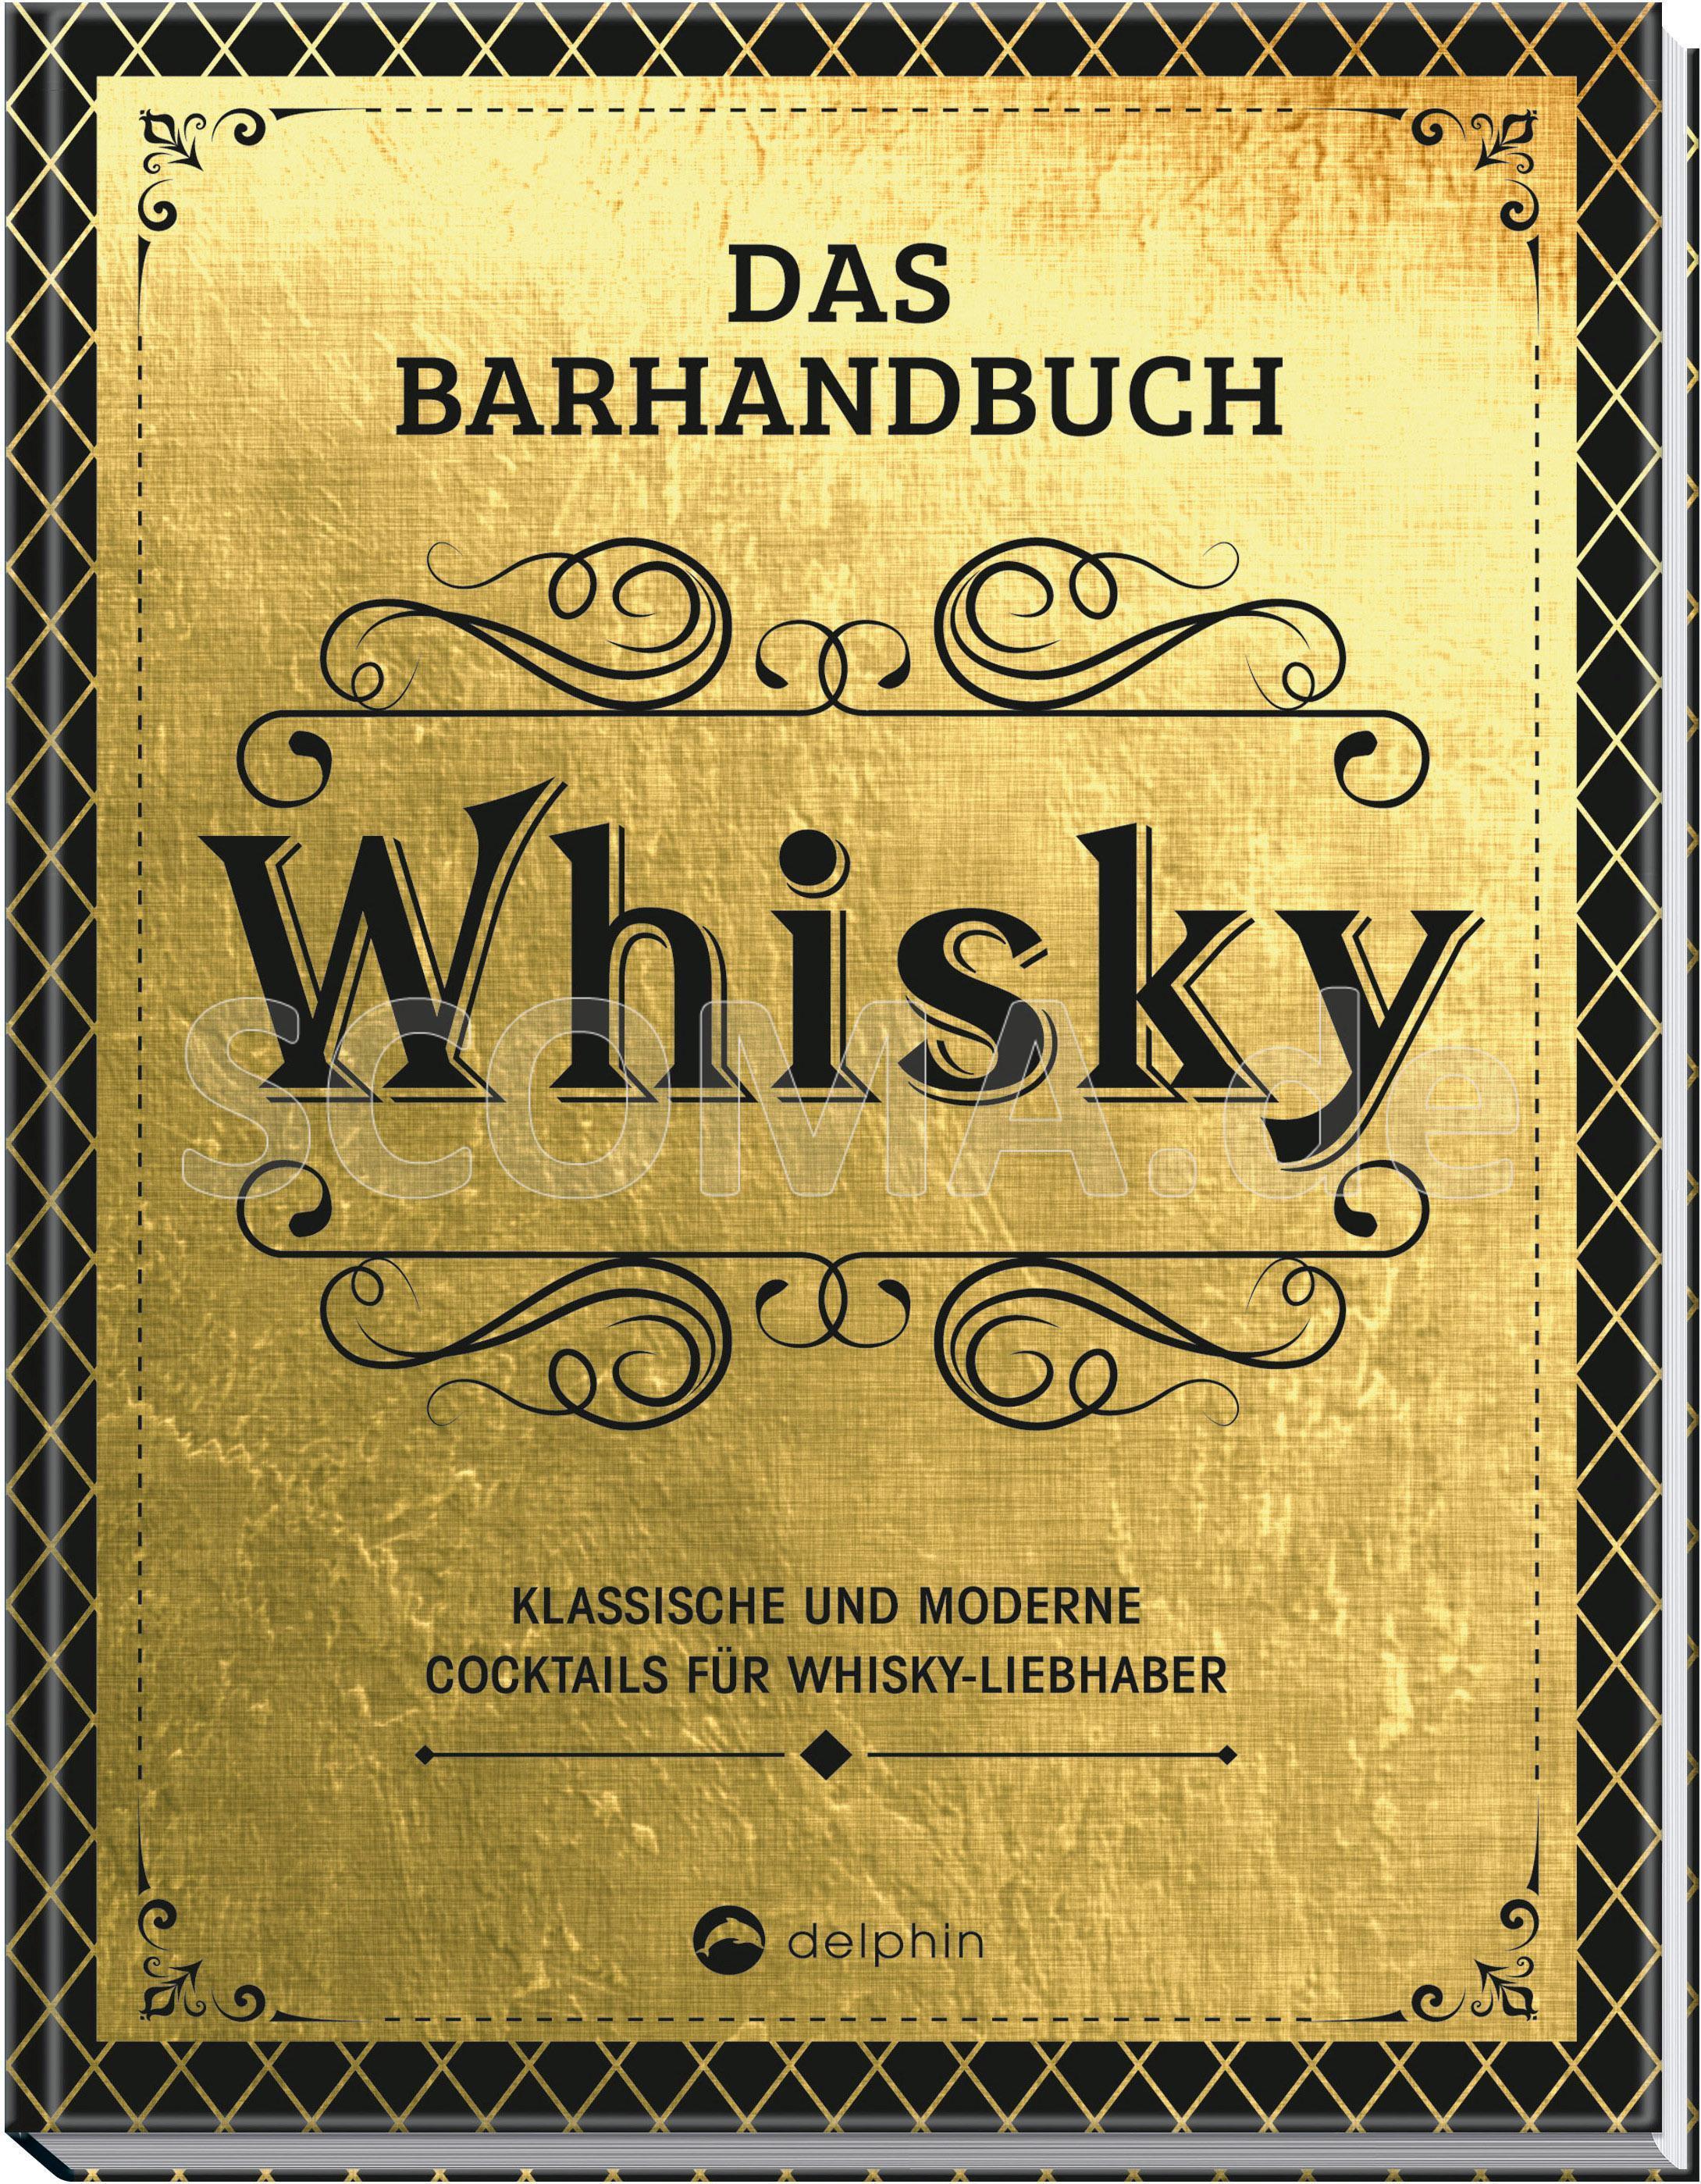 Das Barhandbuch - Whisky